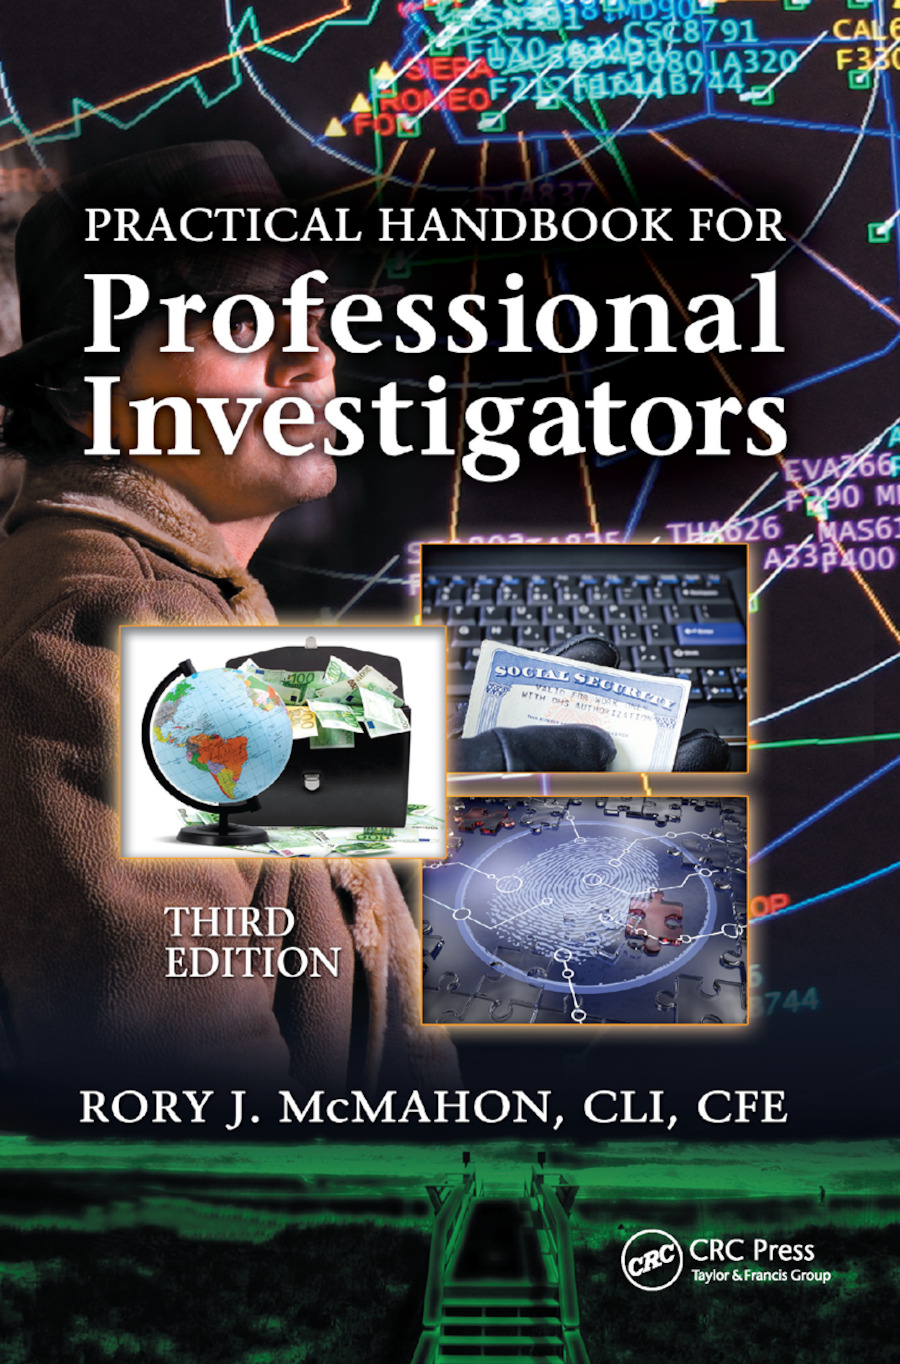 Practical Handbook for Professional Investigators book cover